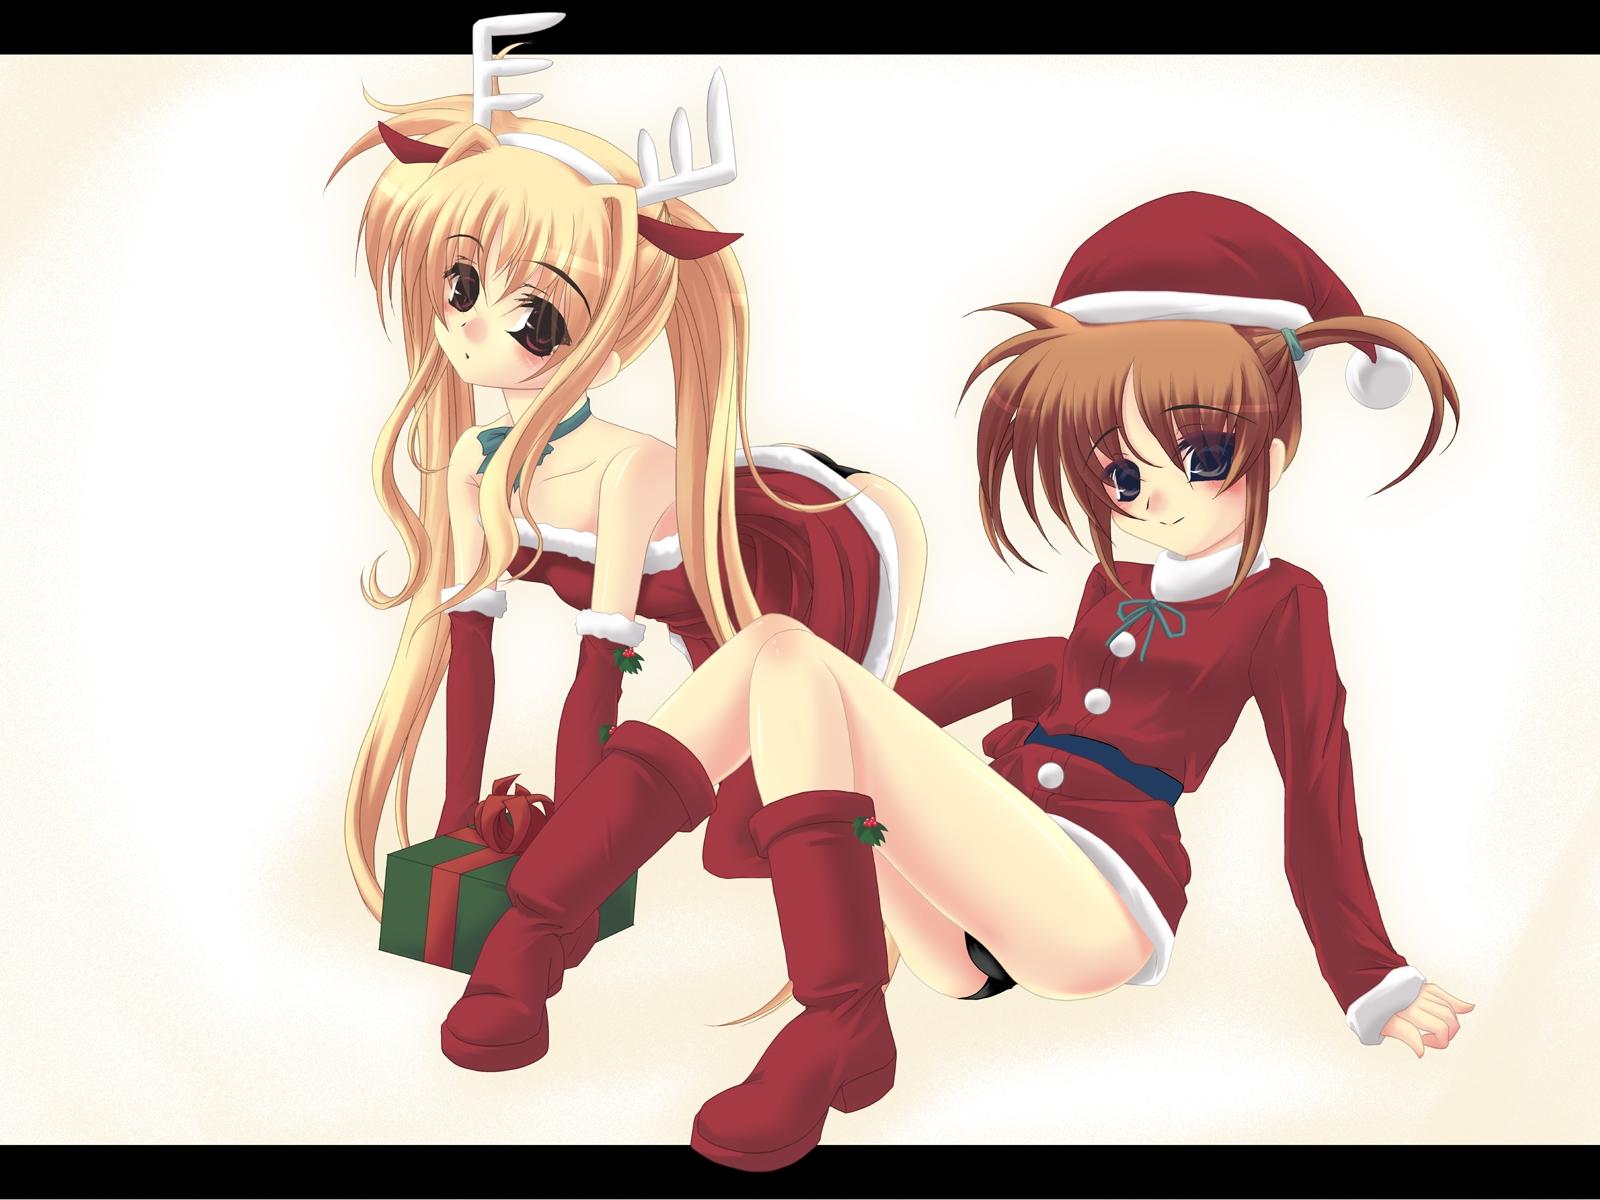 christmas fate_testarossa mahou_shoujo_lyrical_nanoha panties takamachi_nanoha underwear